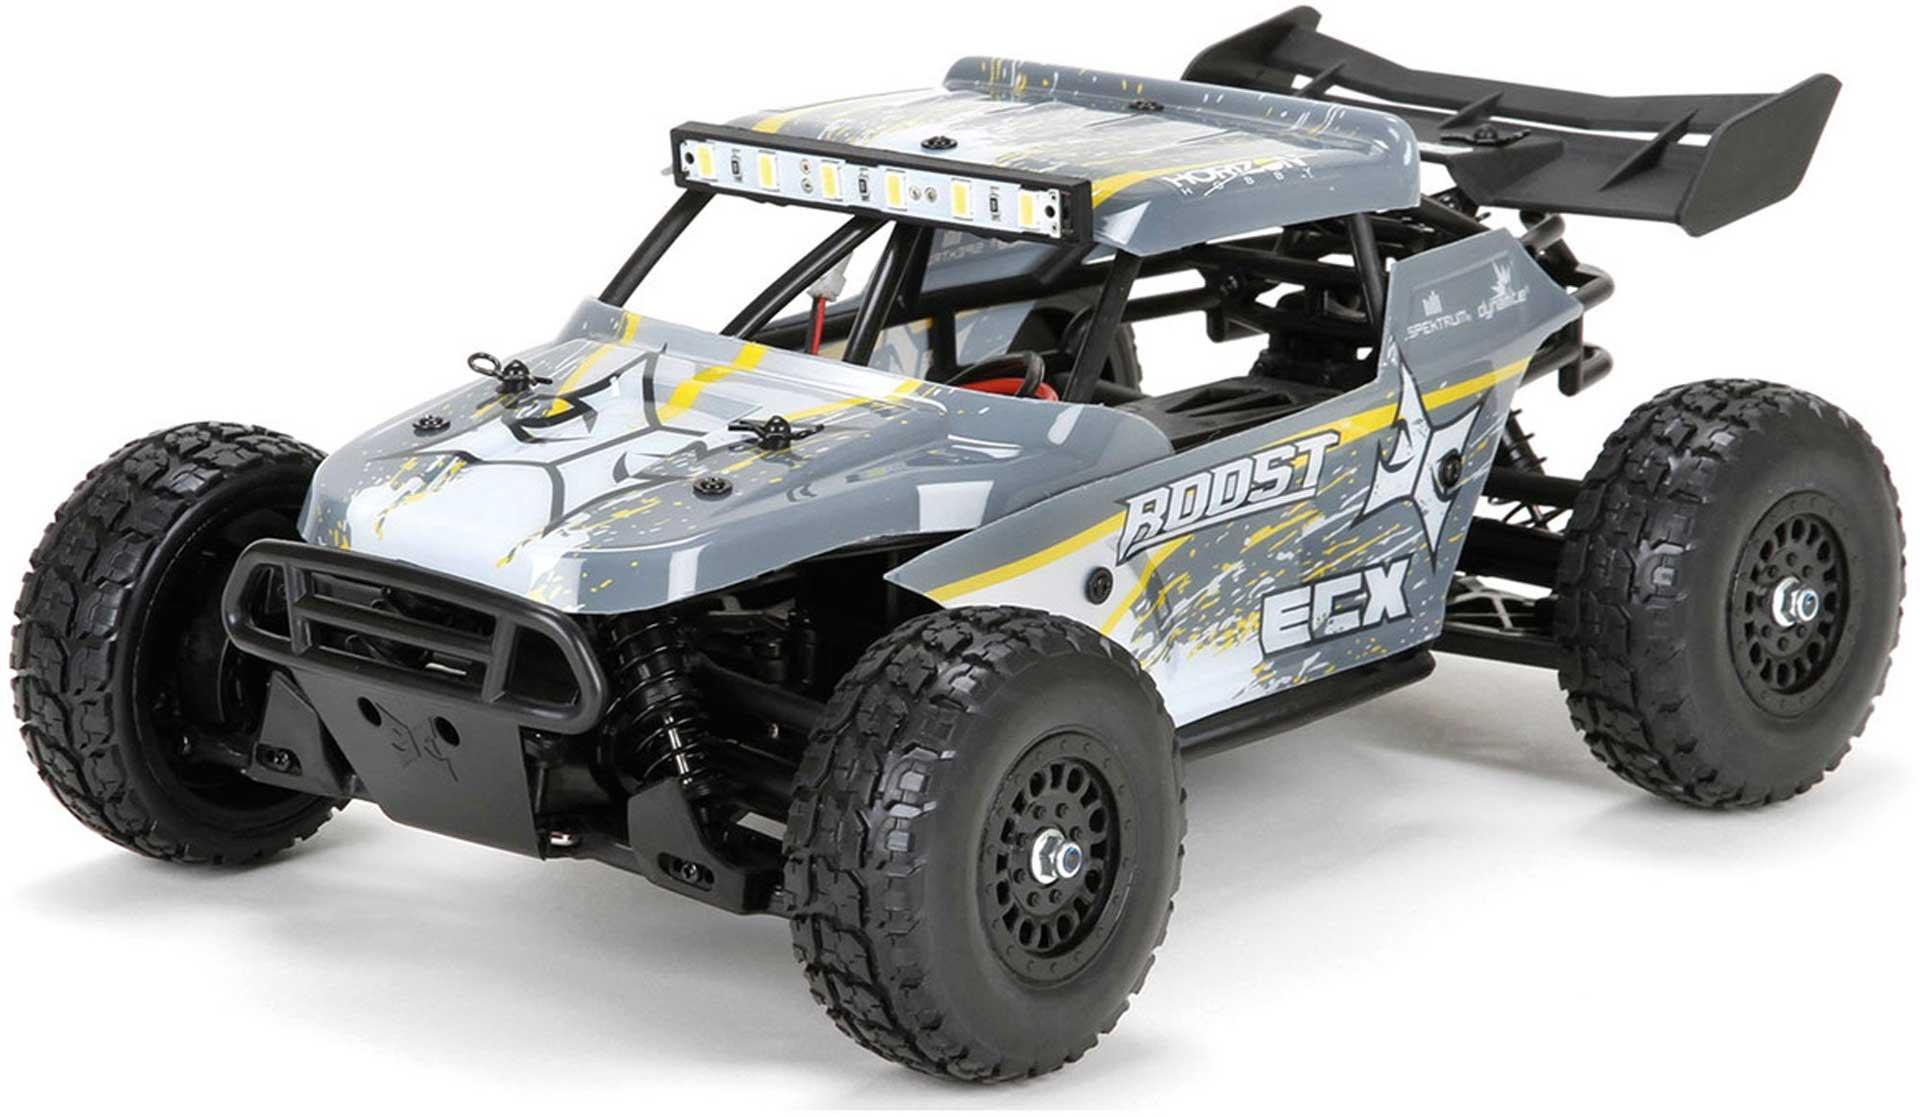 ECX ROOST 1/18 4WD DESERT BUGGY RTR GRAU/GEL GRAU / GELB